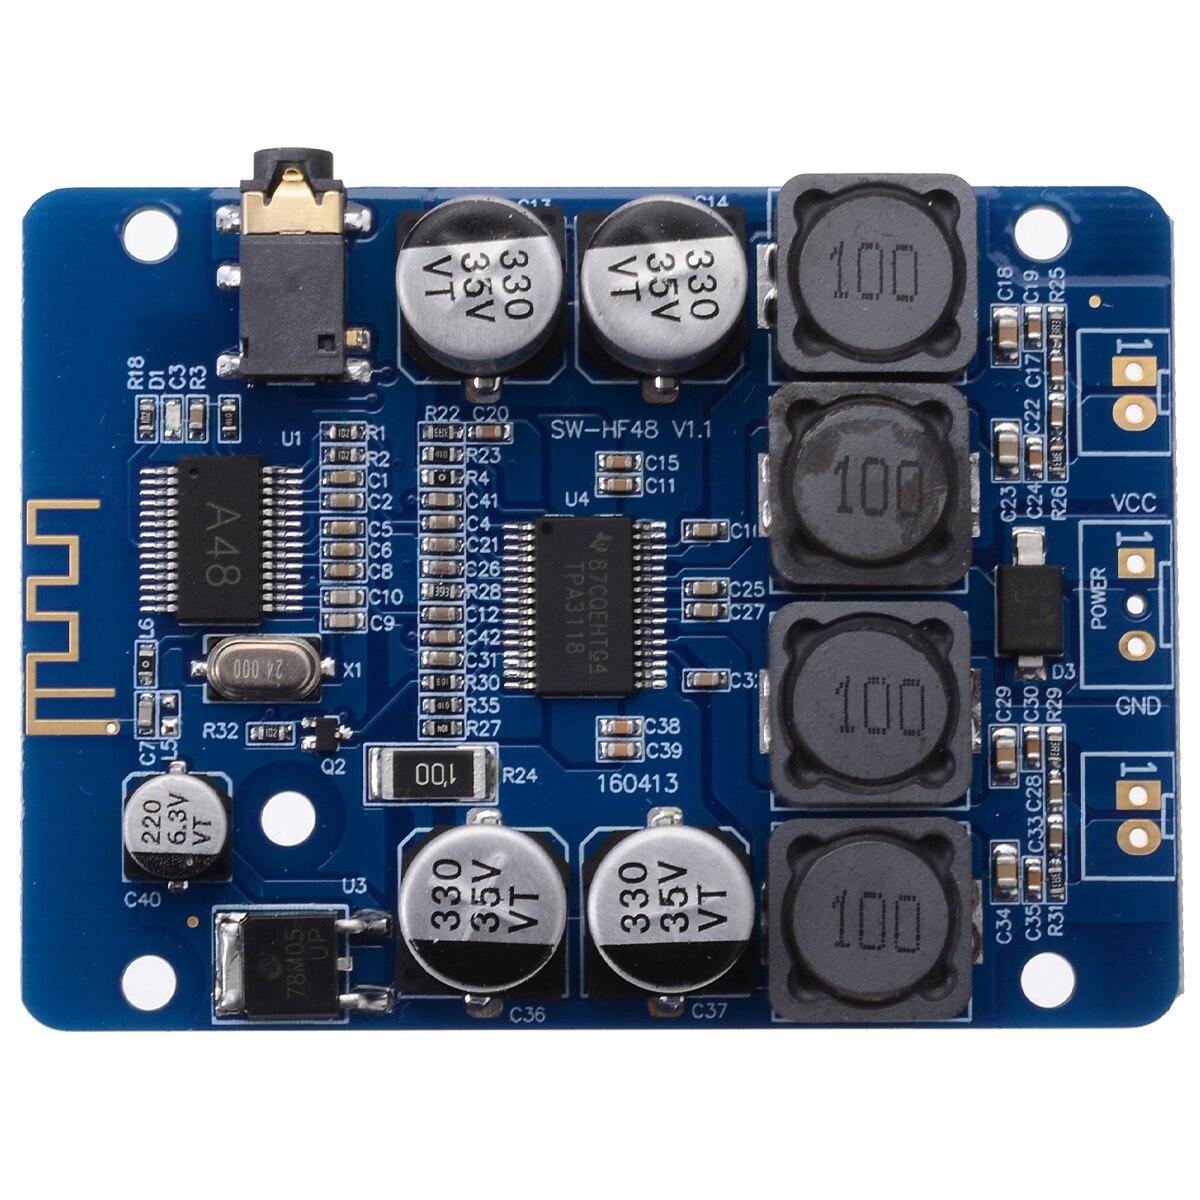 New TPA3118 2x30W DIY Audio Amplifier 8-26V DC Stereo Speaker bluetooth Digital Power AMP Board For 4/6/8 Ohm